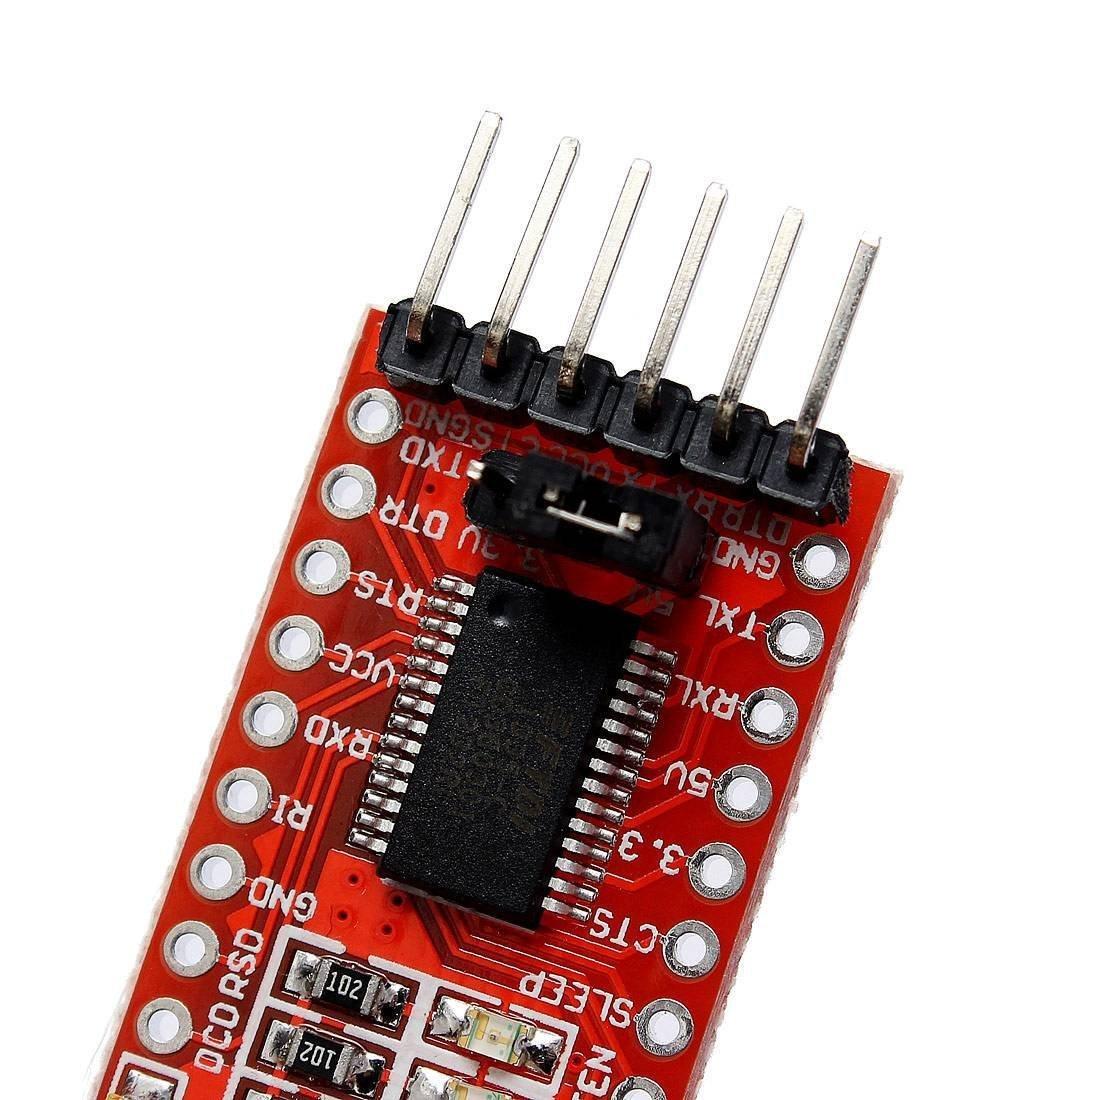 1X NEW FT232RL 3.3V 5.5V FTDI USB to TTL Serial Adapter Module for Arduino Mini